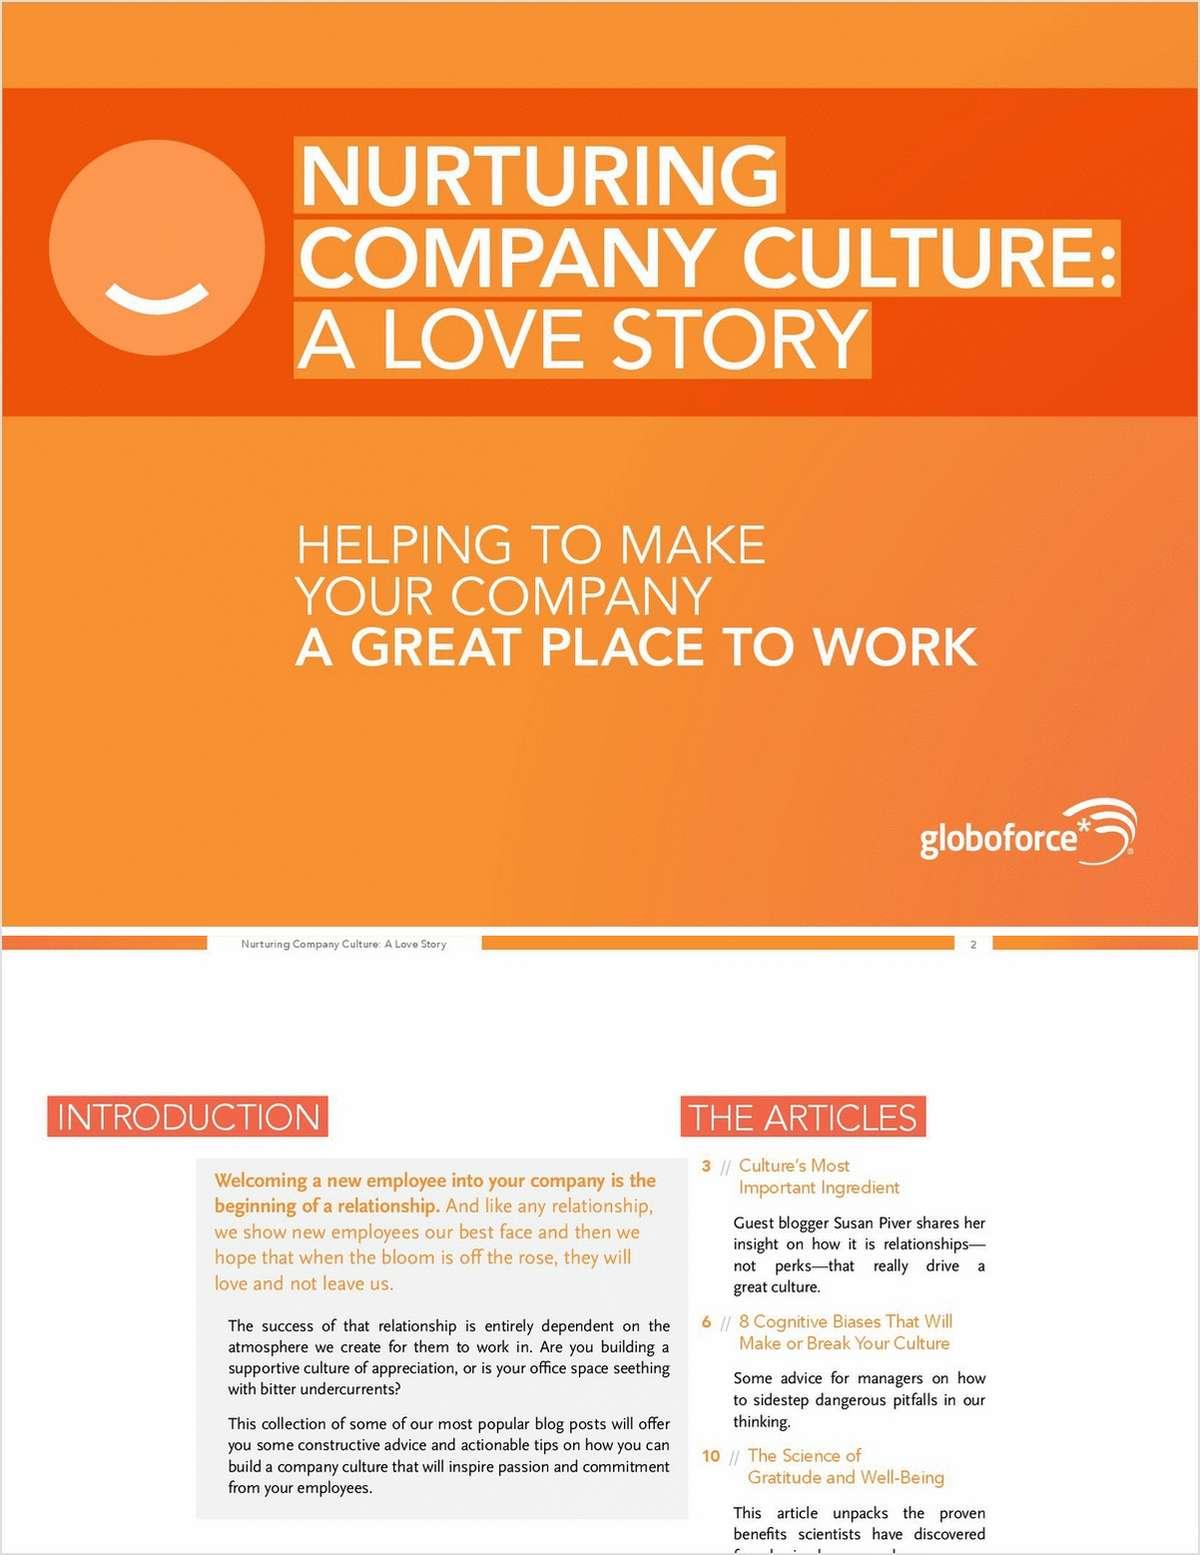 Nurturing Company Culture: A Love Story